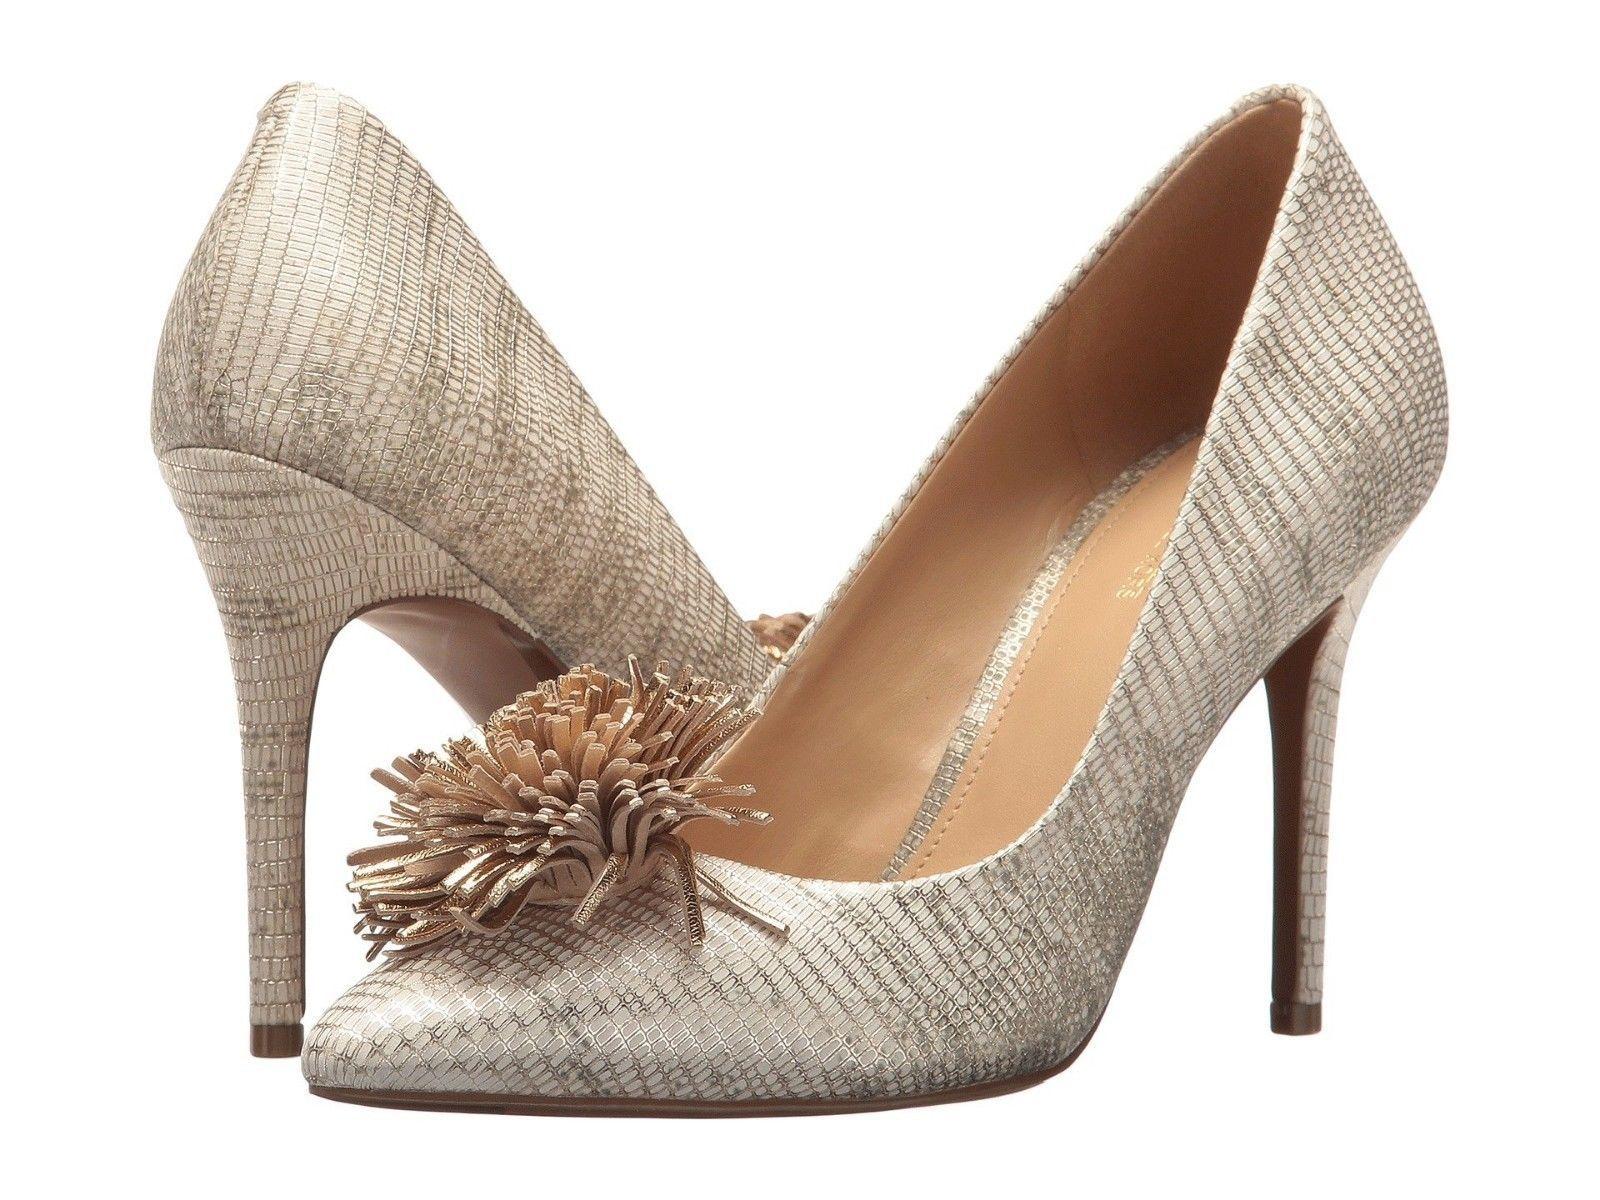 9c808081c5b MICHAEL Michael Kors Lolita Pumps Shoes Mult and 50 similar items